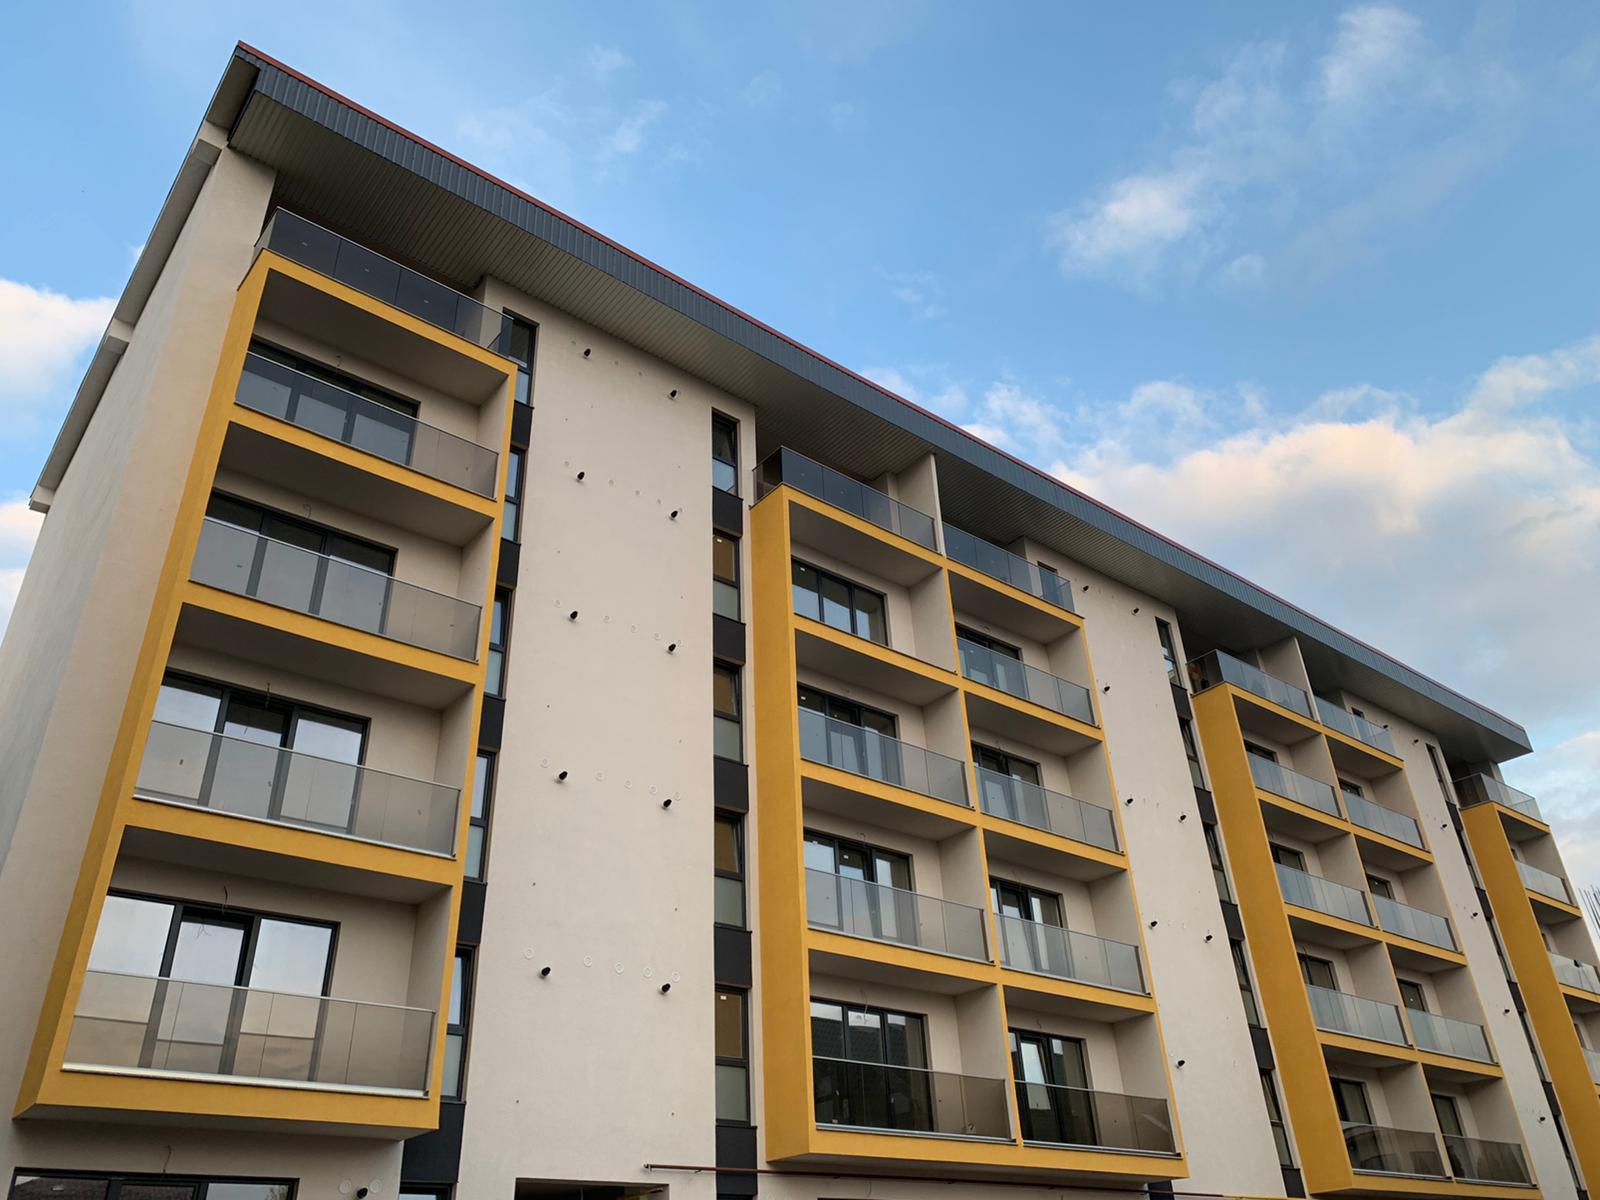 Construcții Civile și Industriale UrBAN House 2